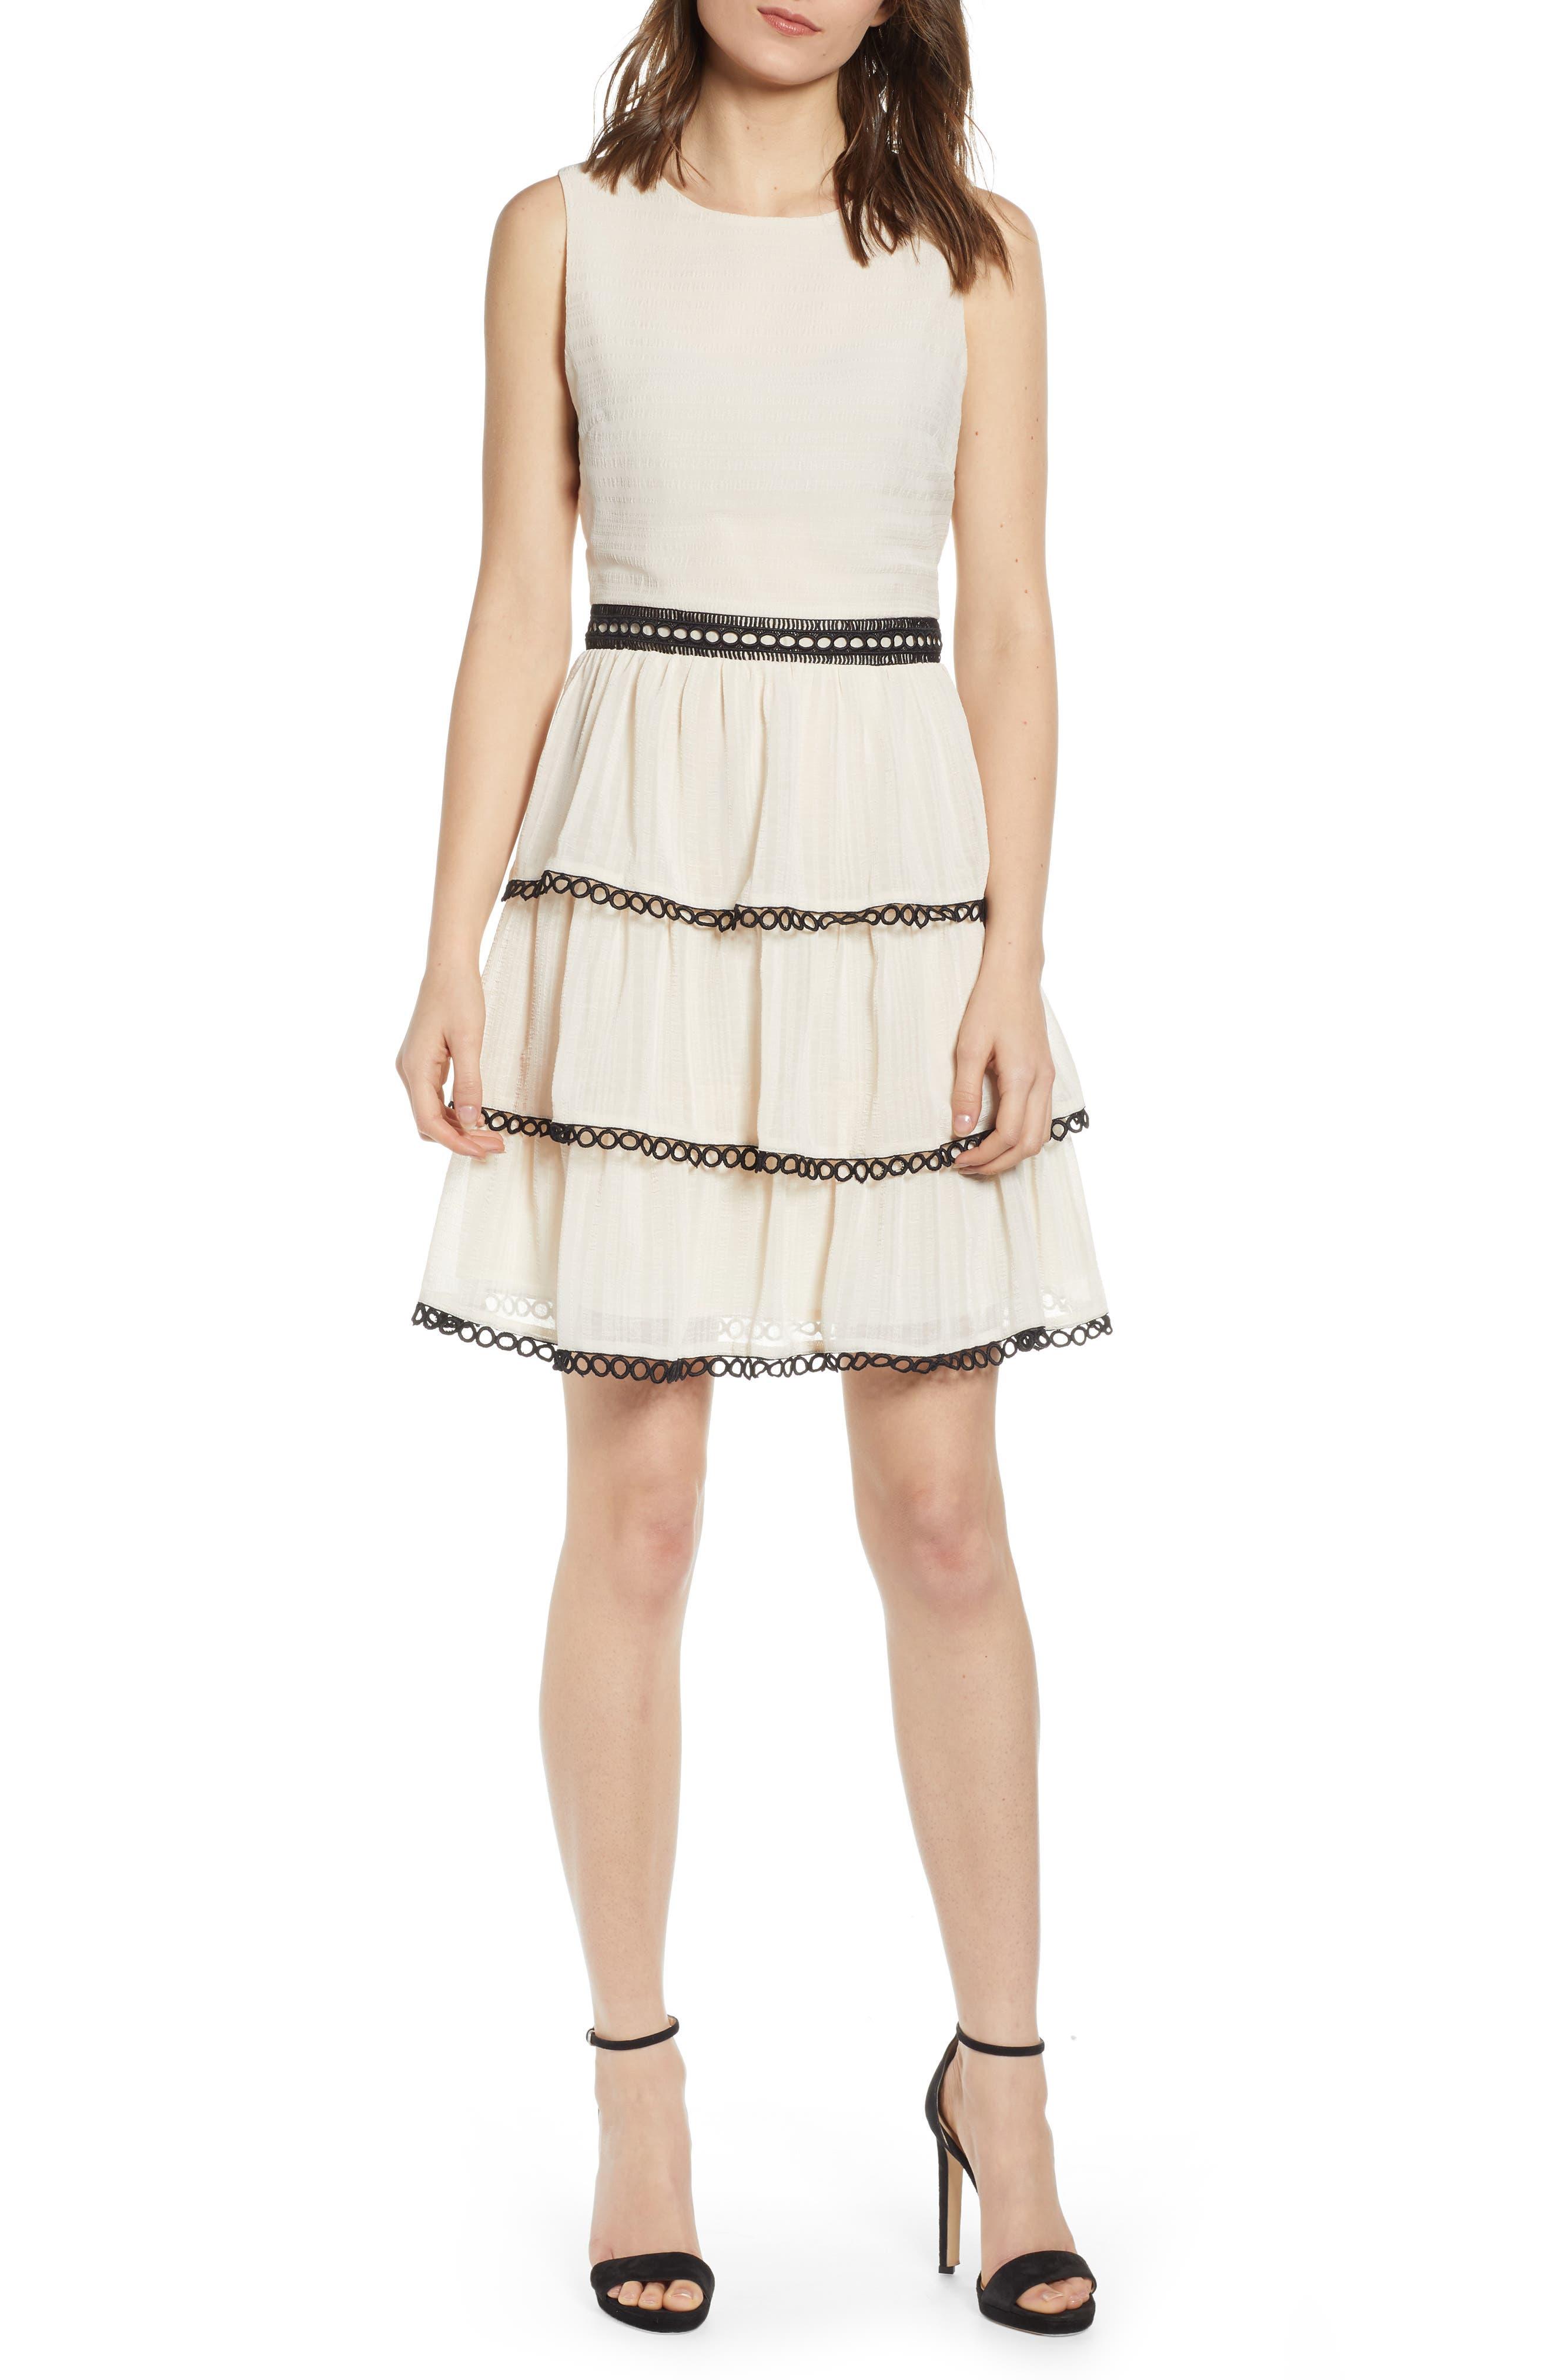 07c563af9ff6 Endless Rose Tiered Sleeveless Dress